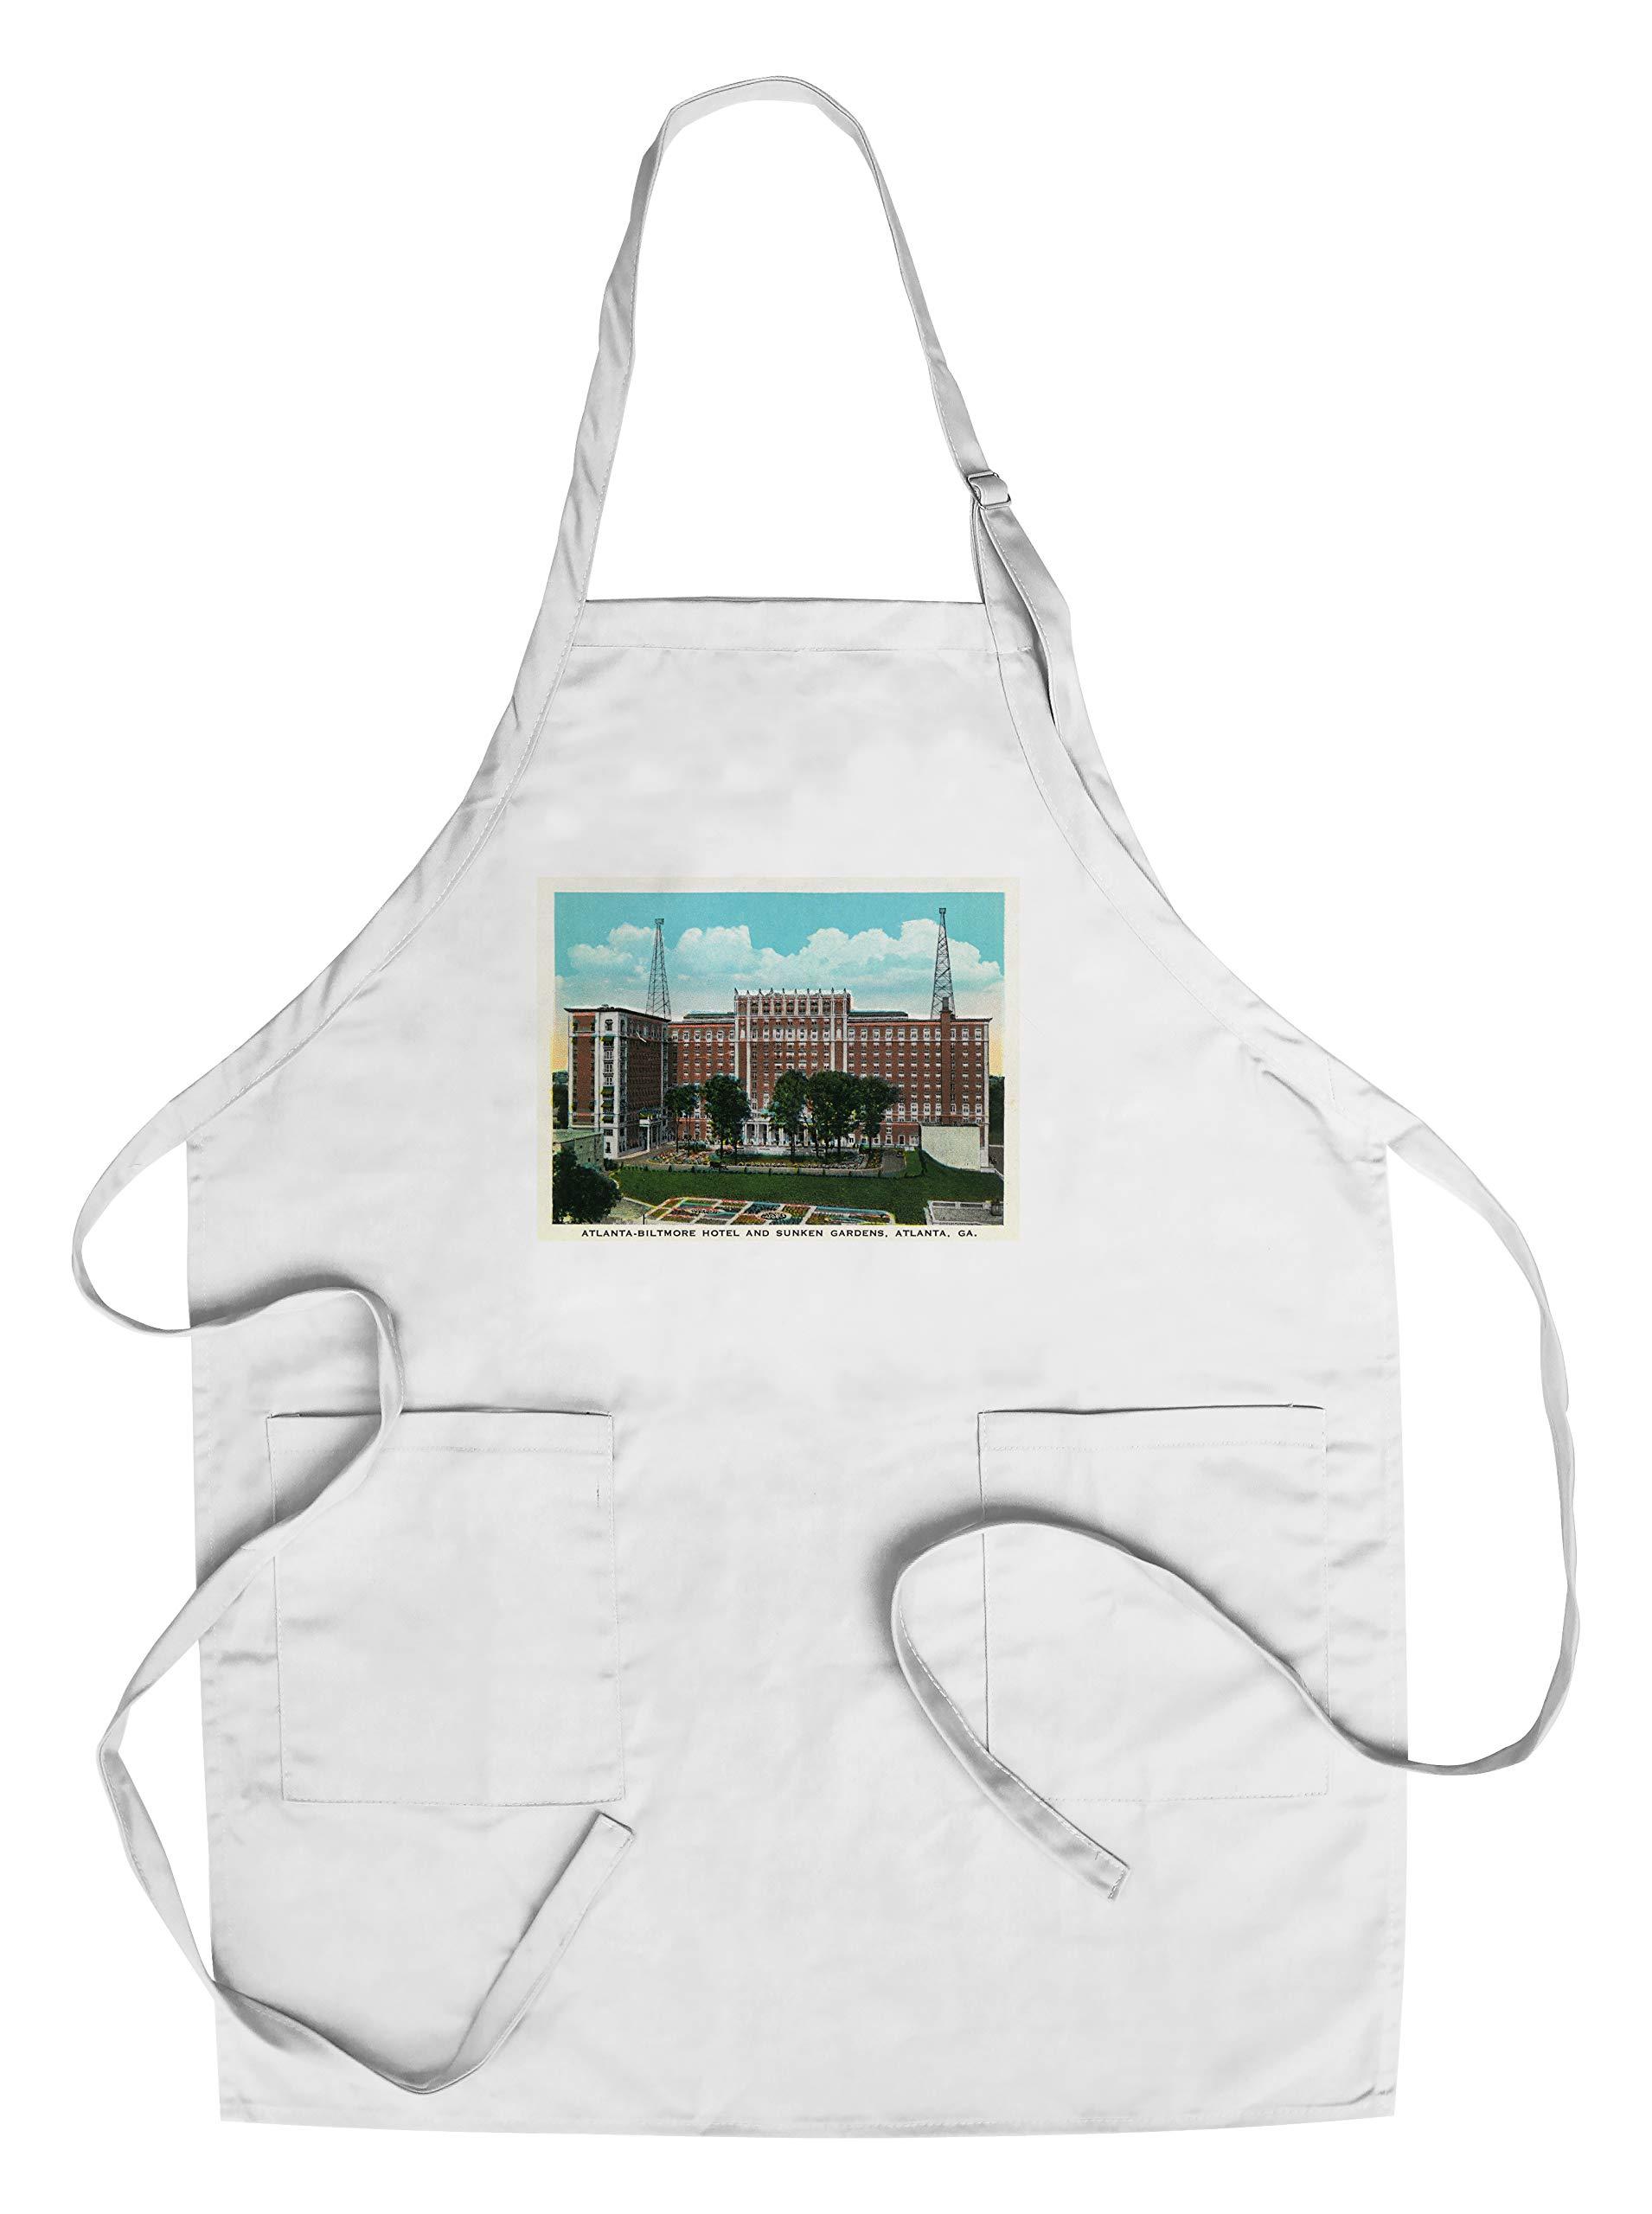 Atlanta, Georgia - Atlanta-Biltmore Hotel Exterior and Sunken Gardens View (Cotton/Polyester Chef's Apron)